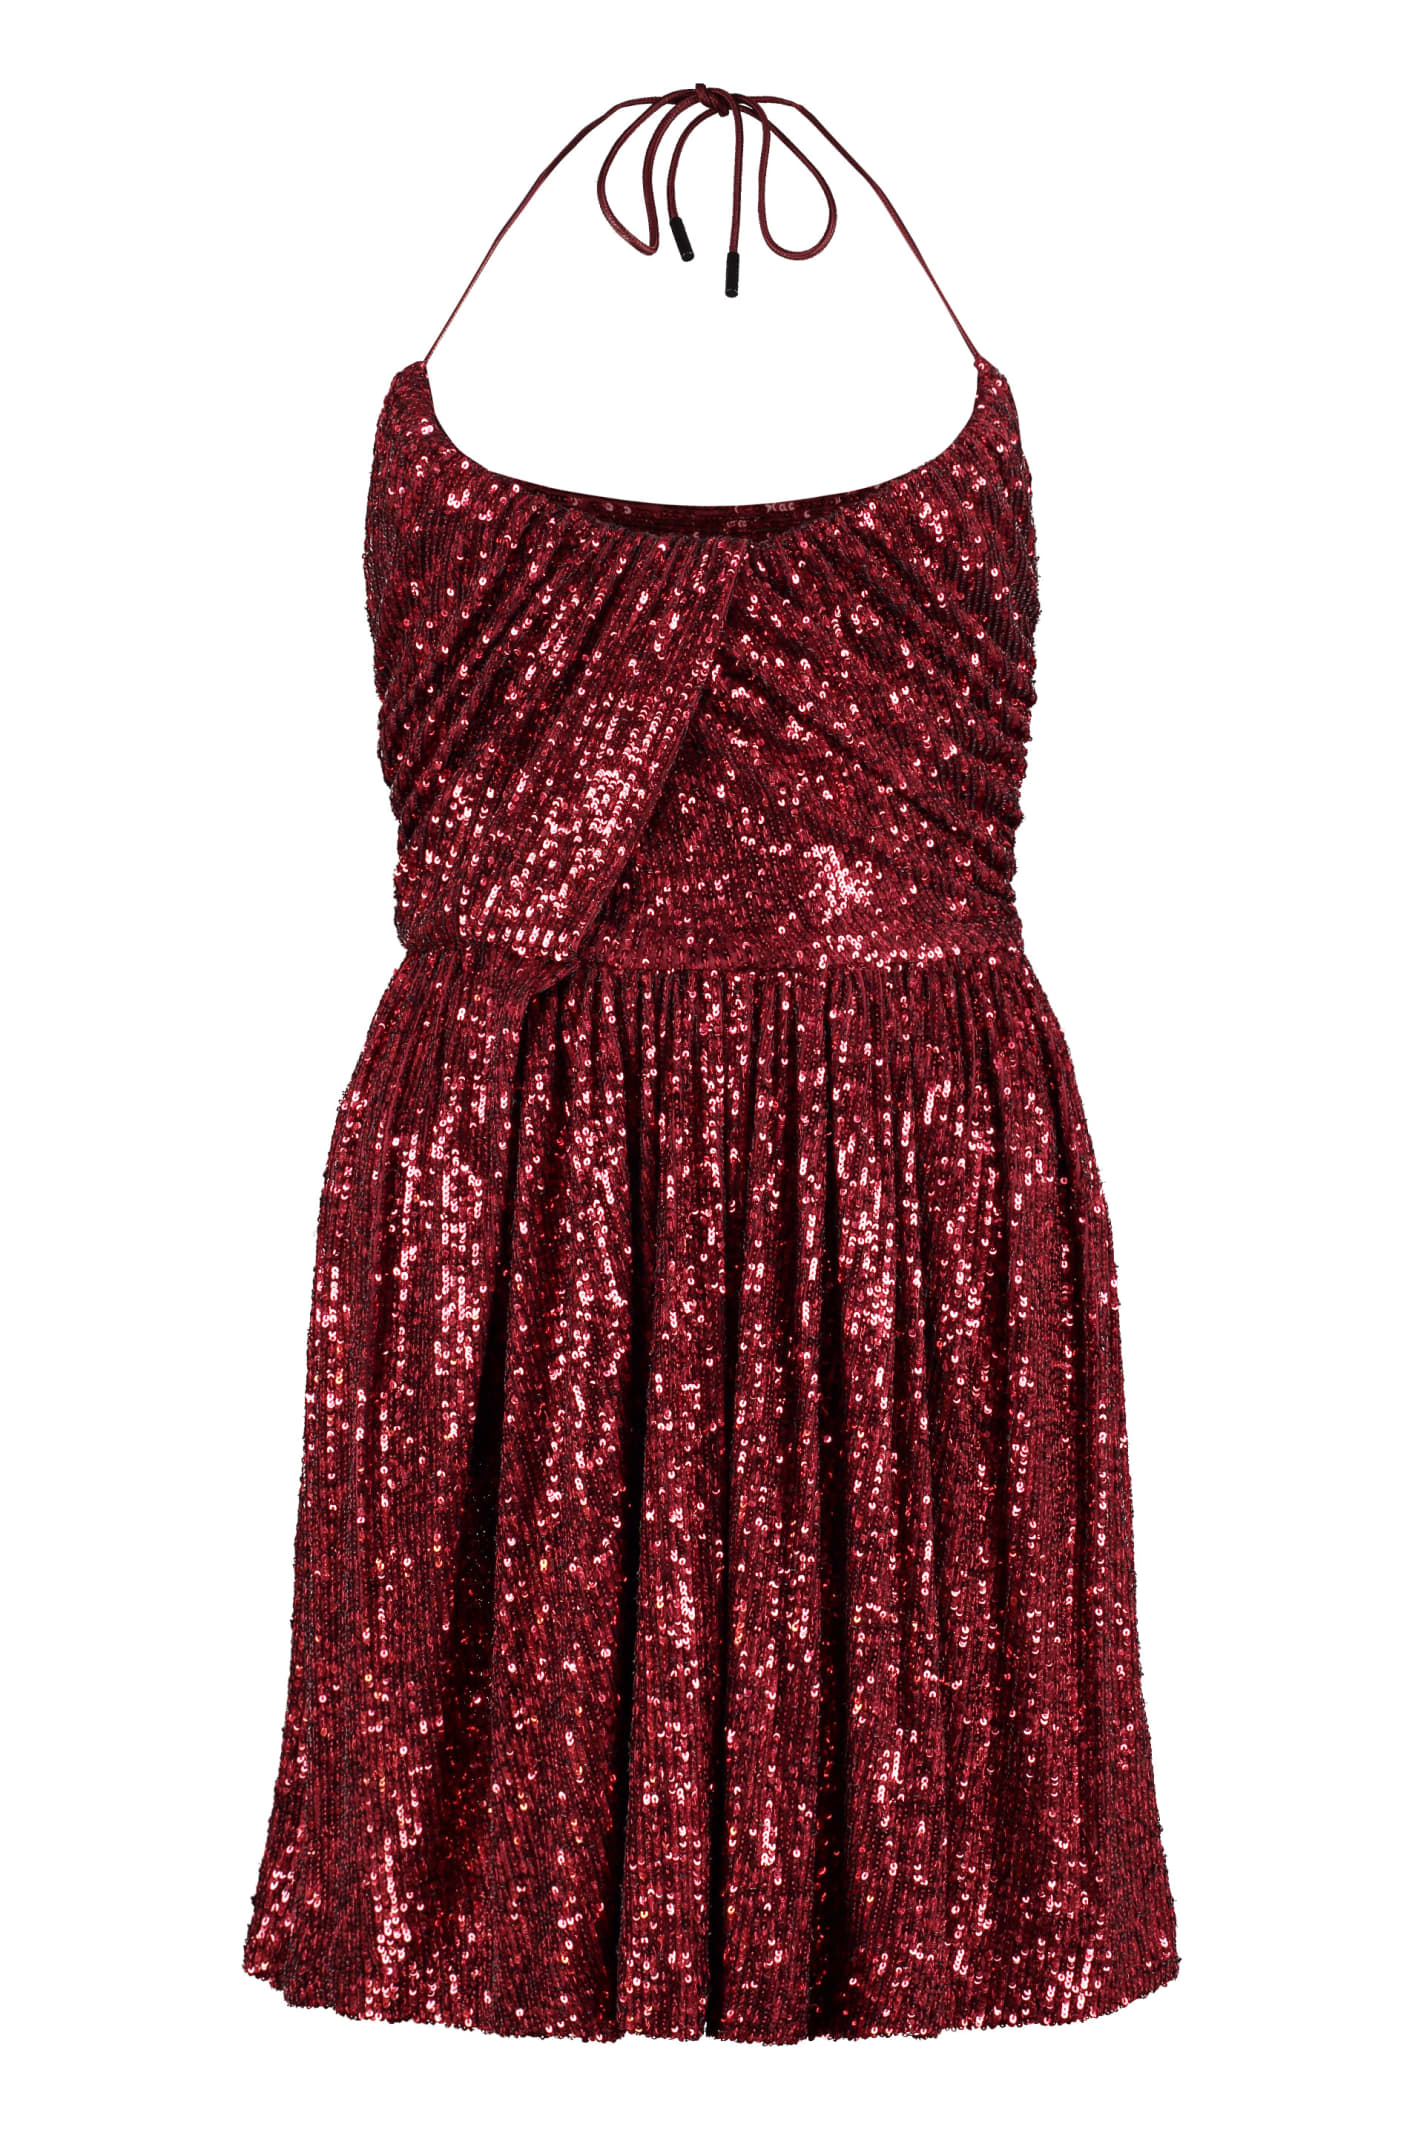 Saint Laurent Sequined Mini-dress